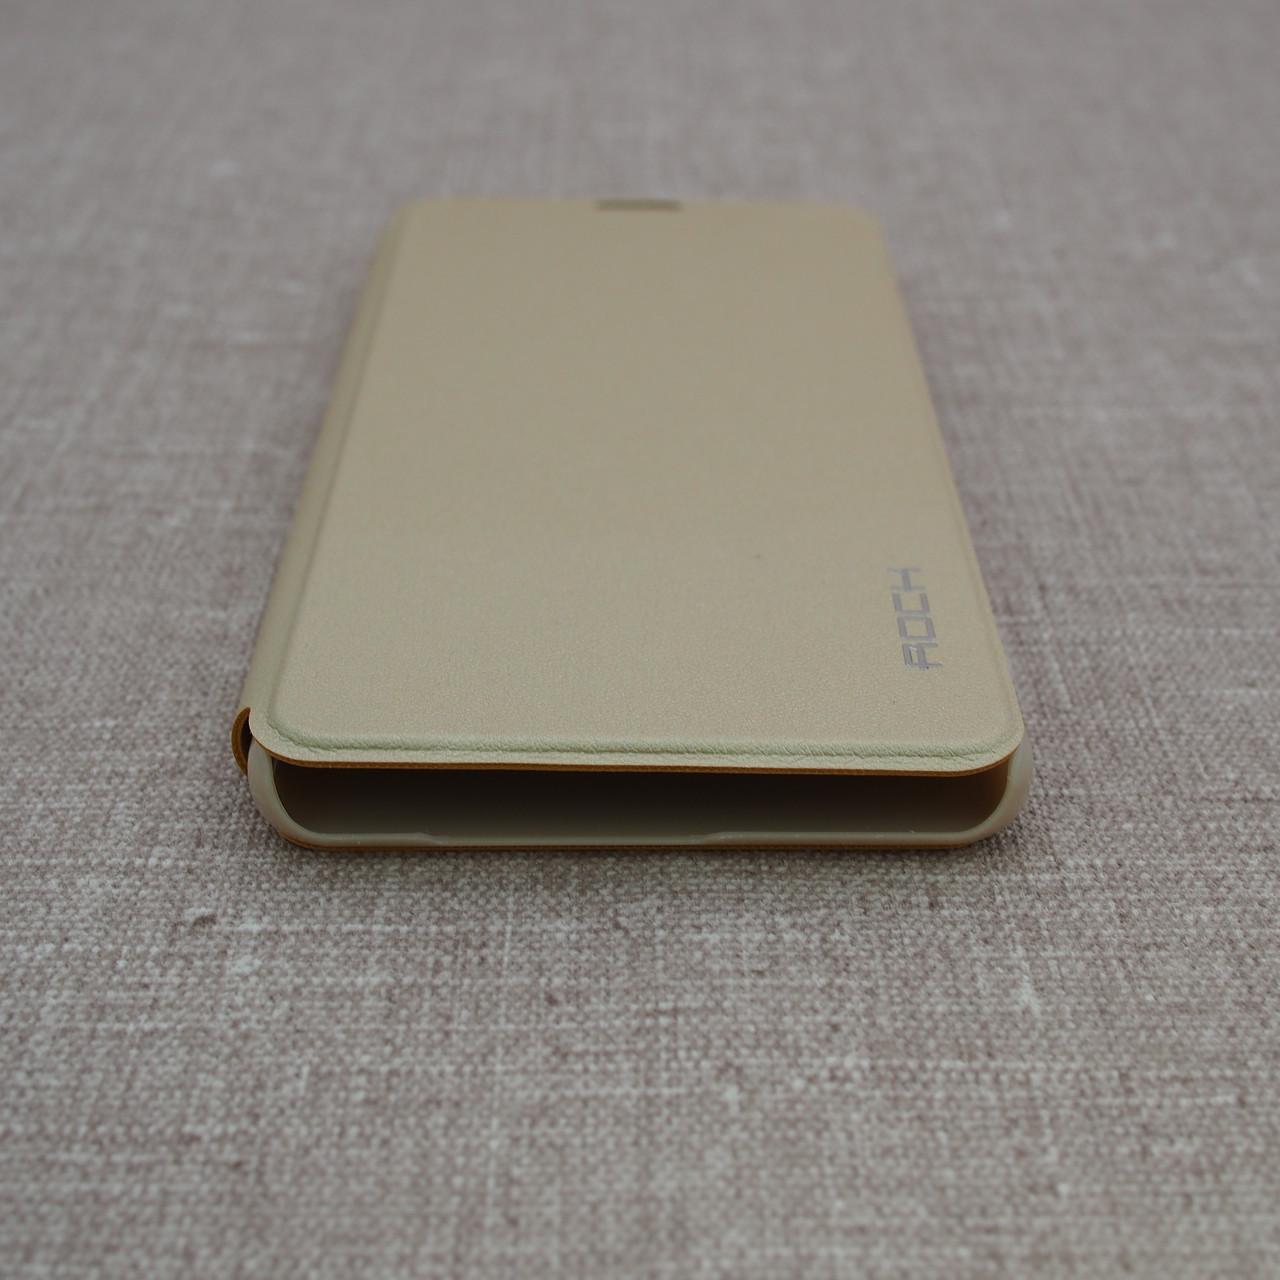 ROCK Touch Samsung Galaxy A7 gold